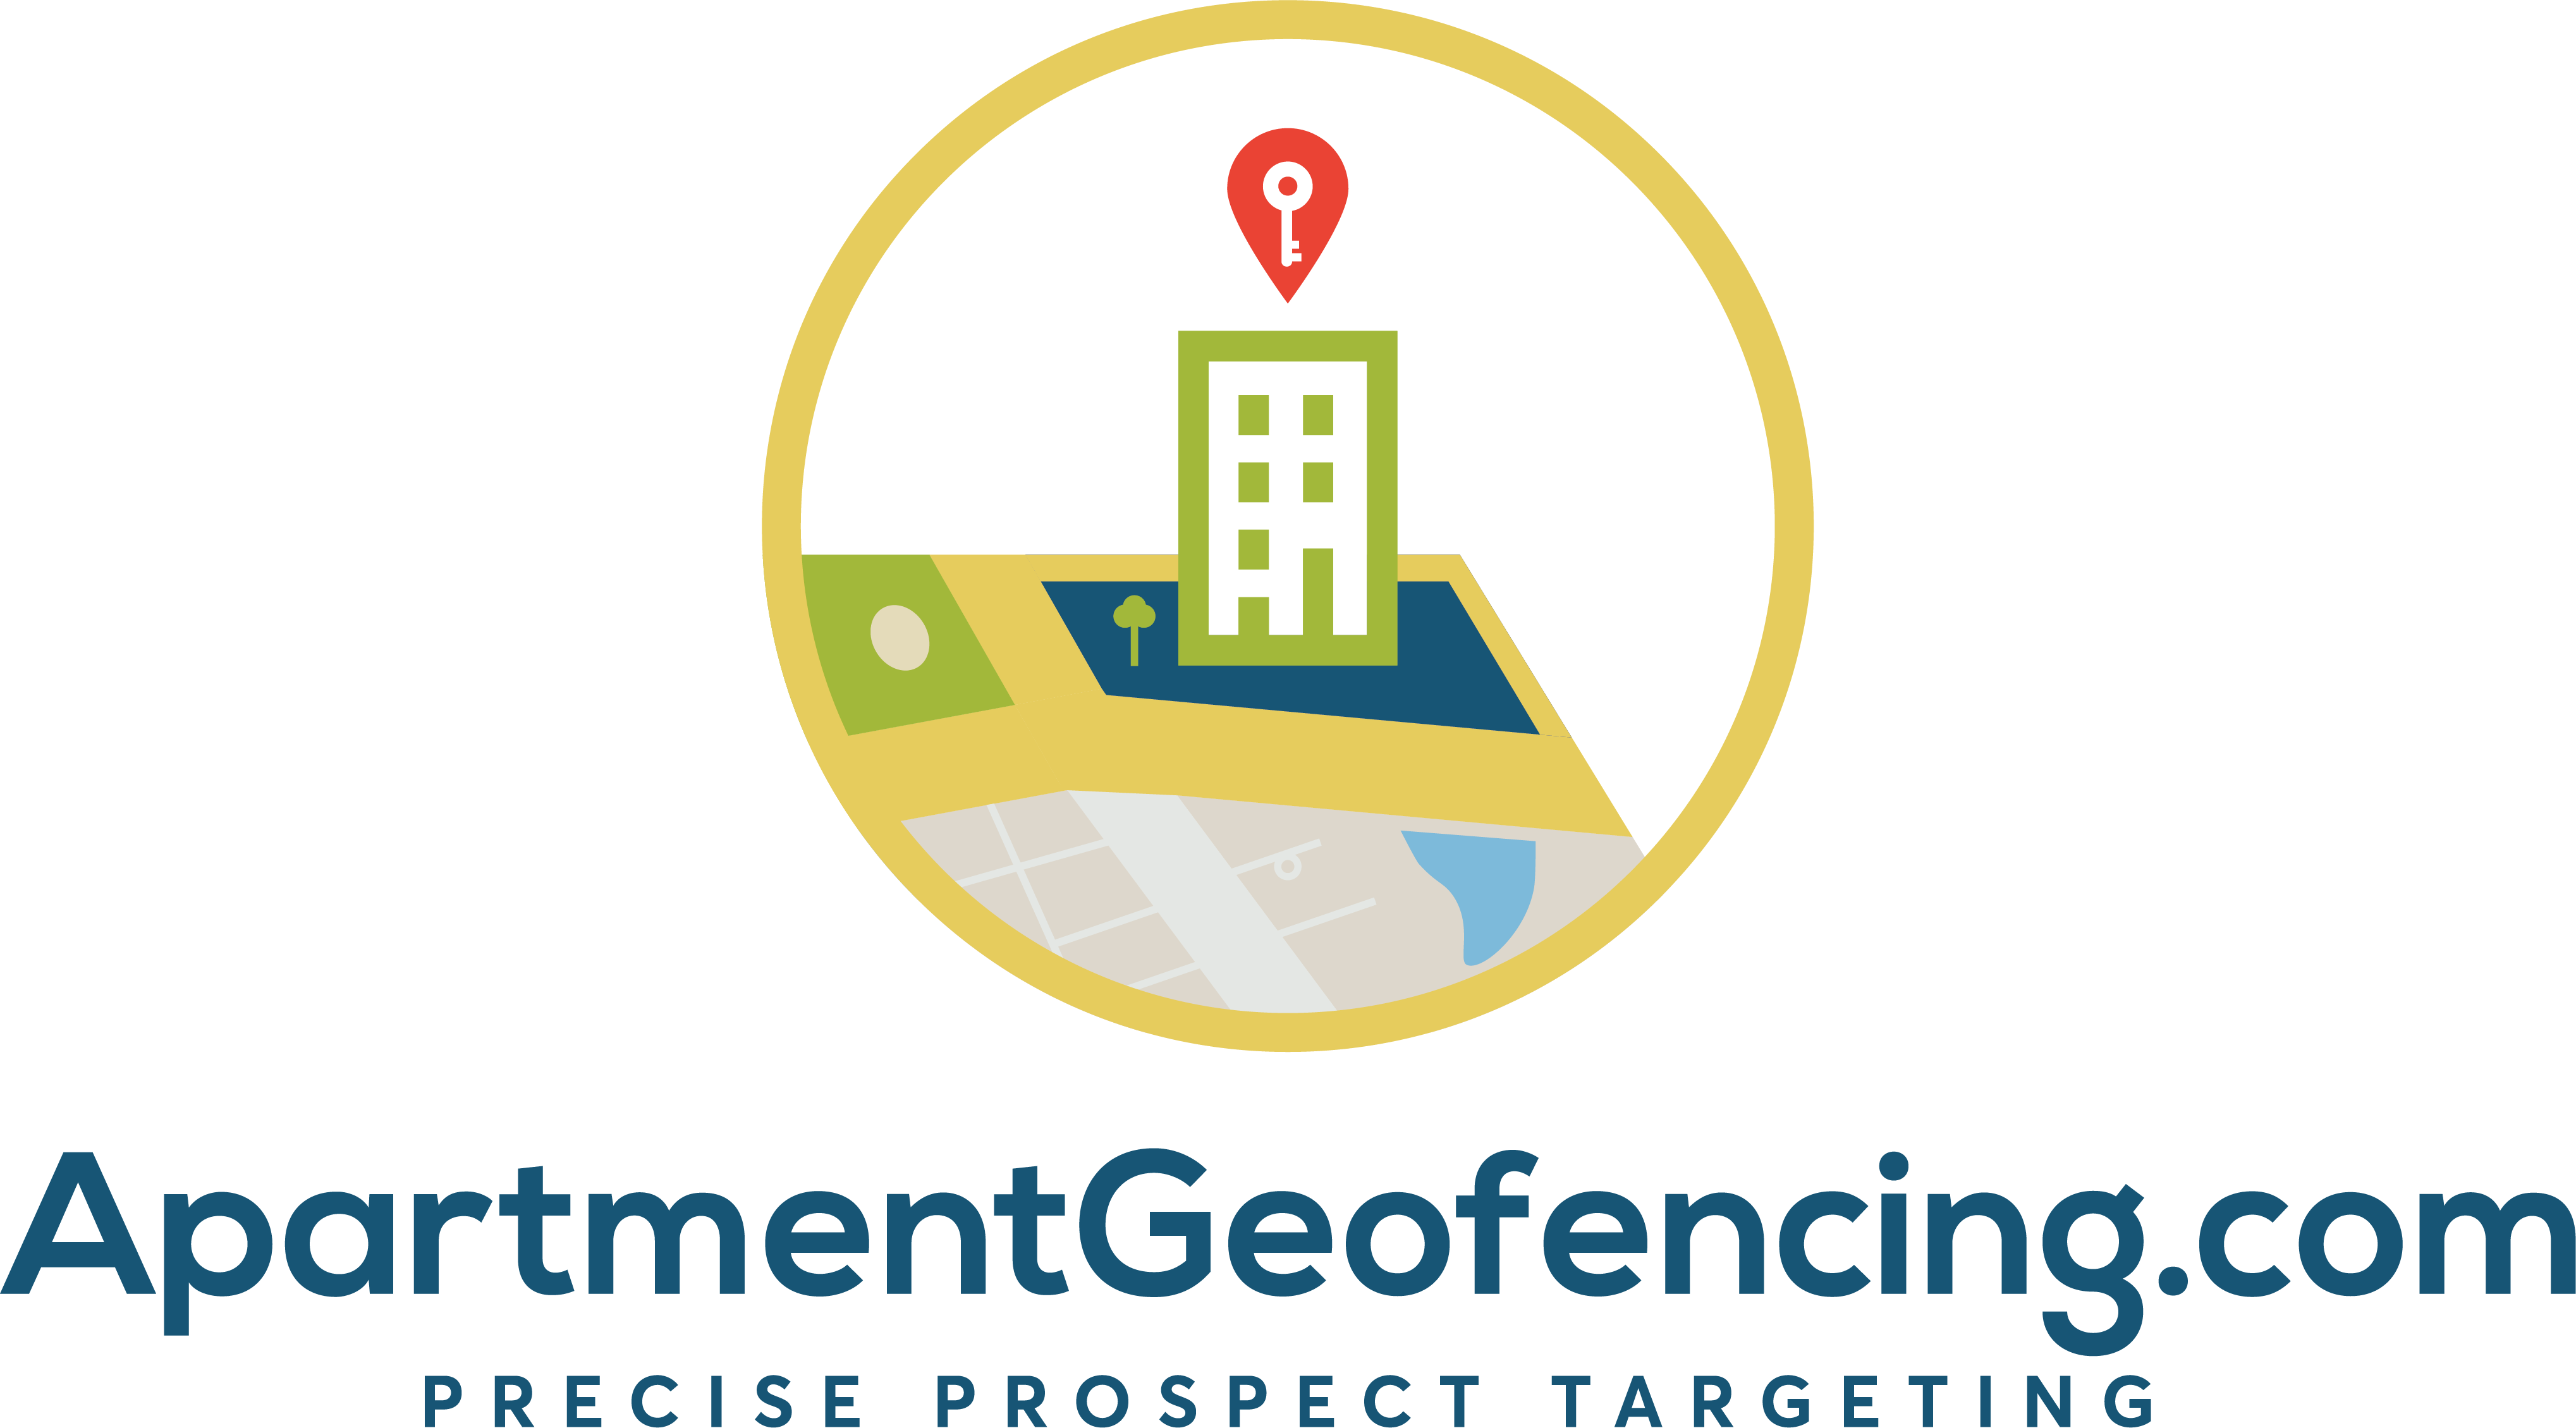 Apartment Geofencing